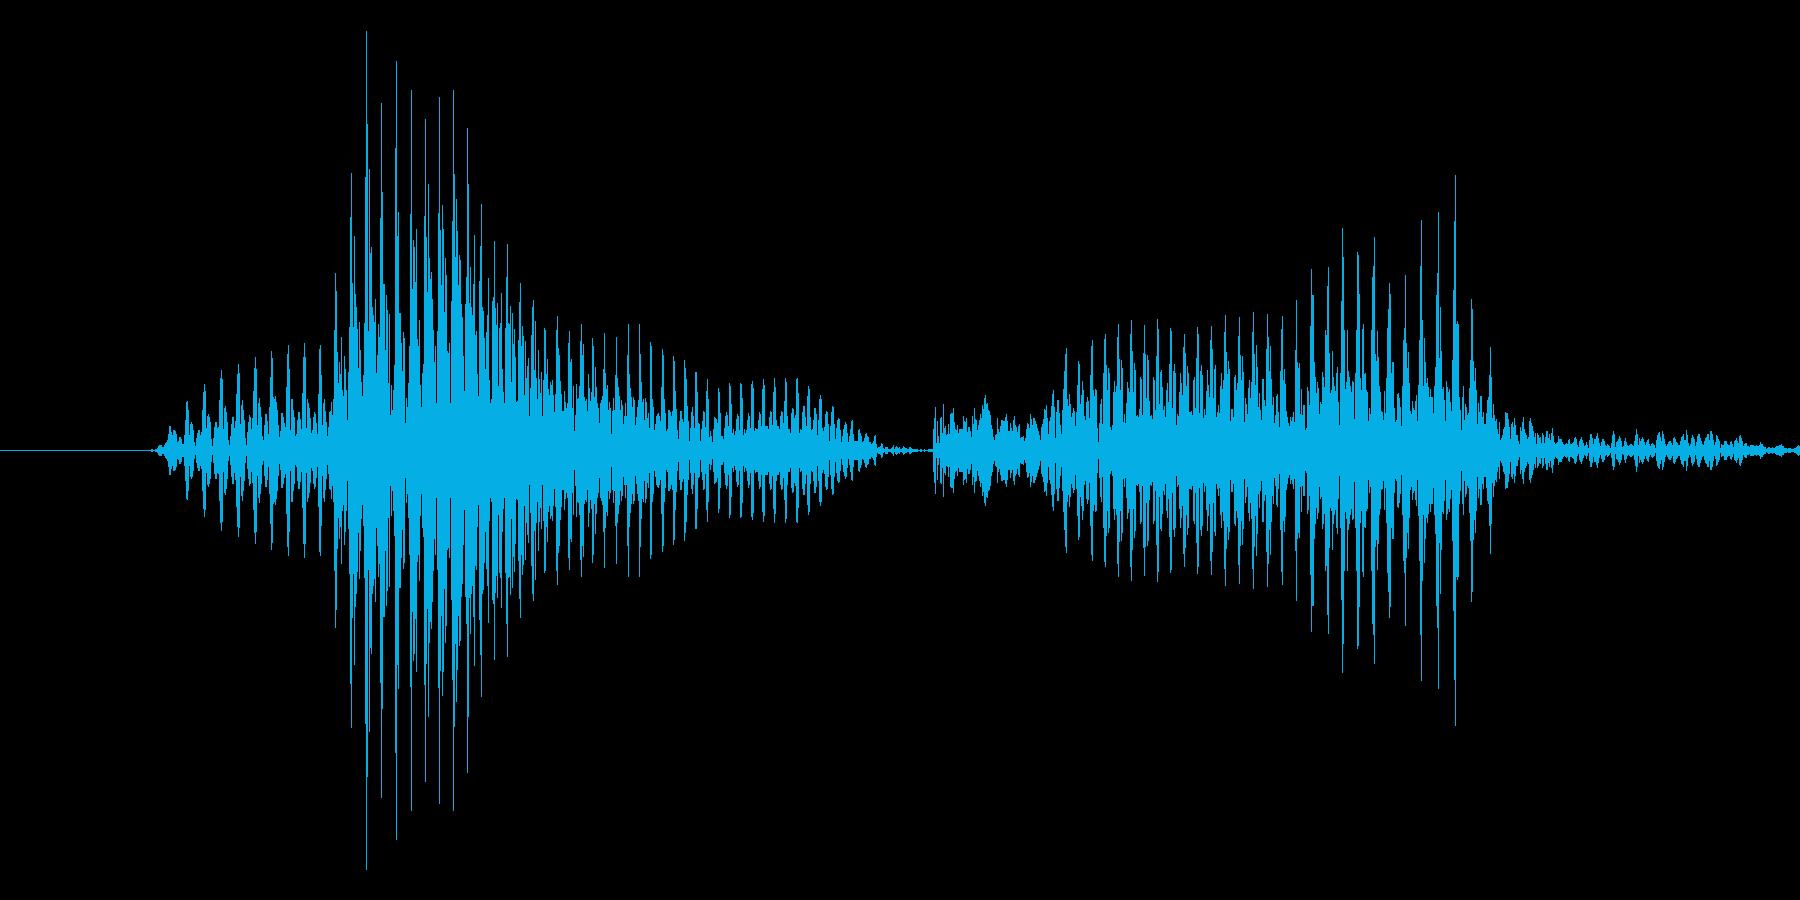 「9 PM」英語発音の再生済みの波形